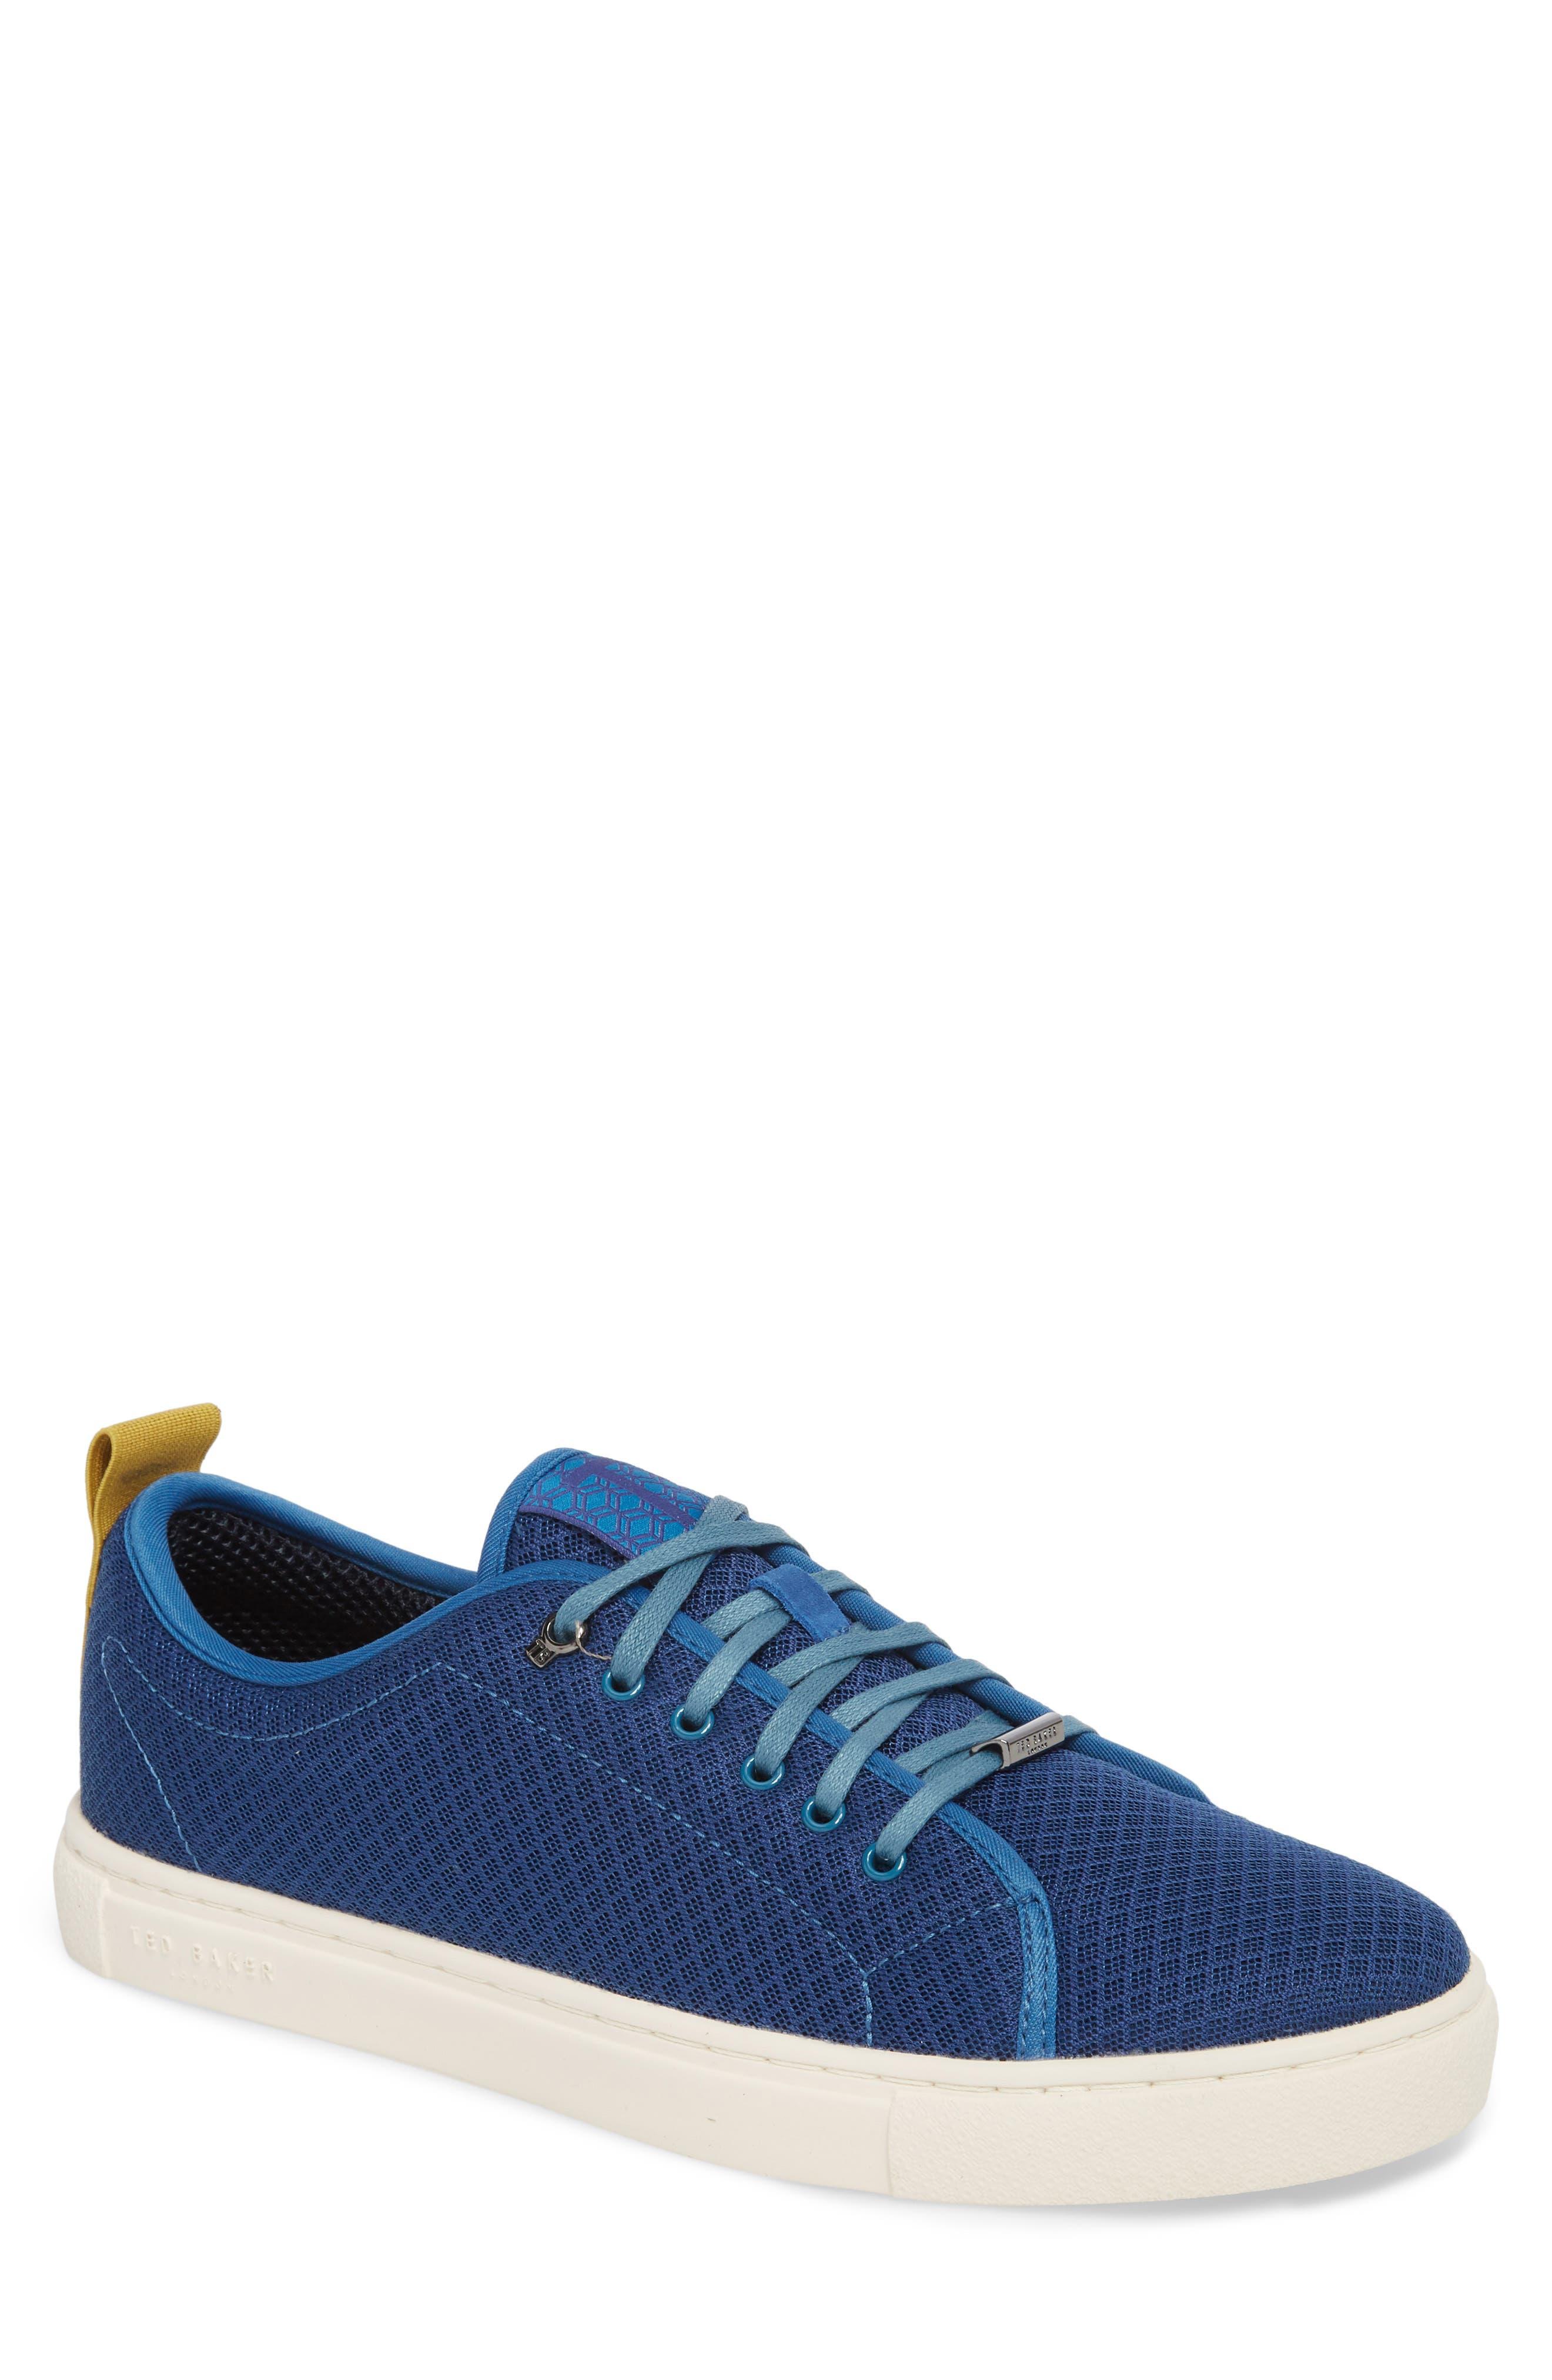 Lannse Low Top Mesh Sneaker,                             Main thumbnail 1, color,                             454